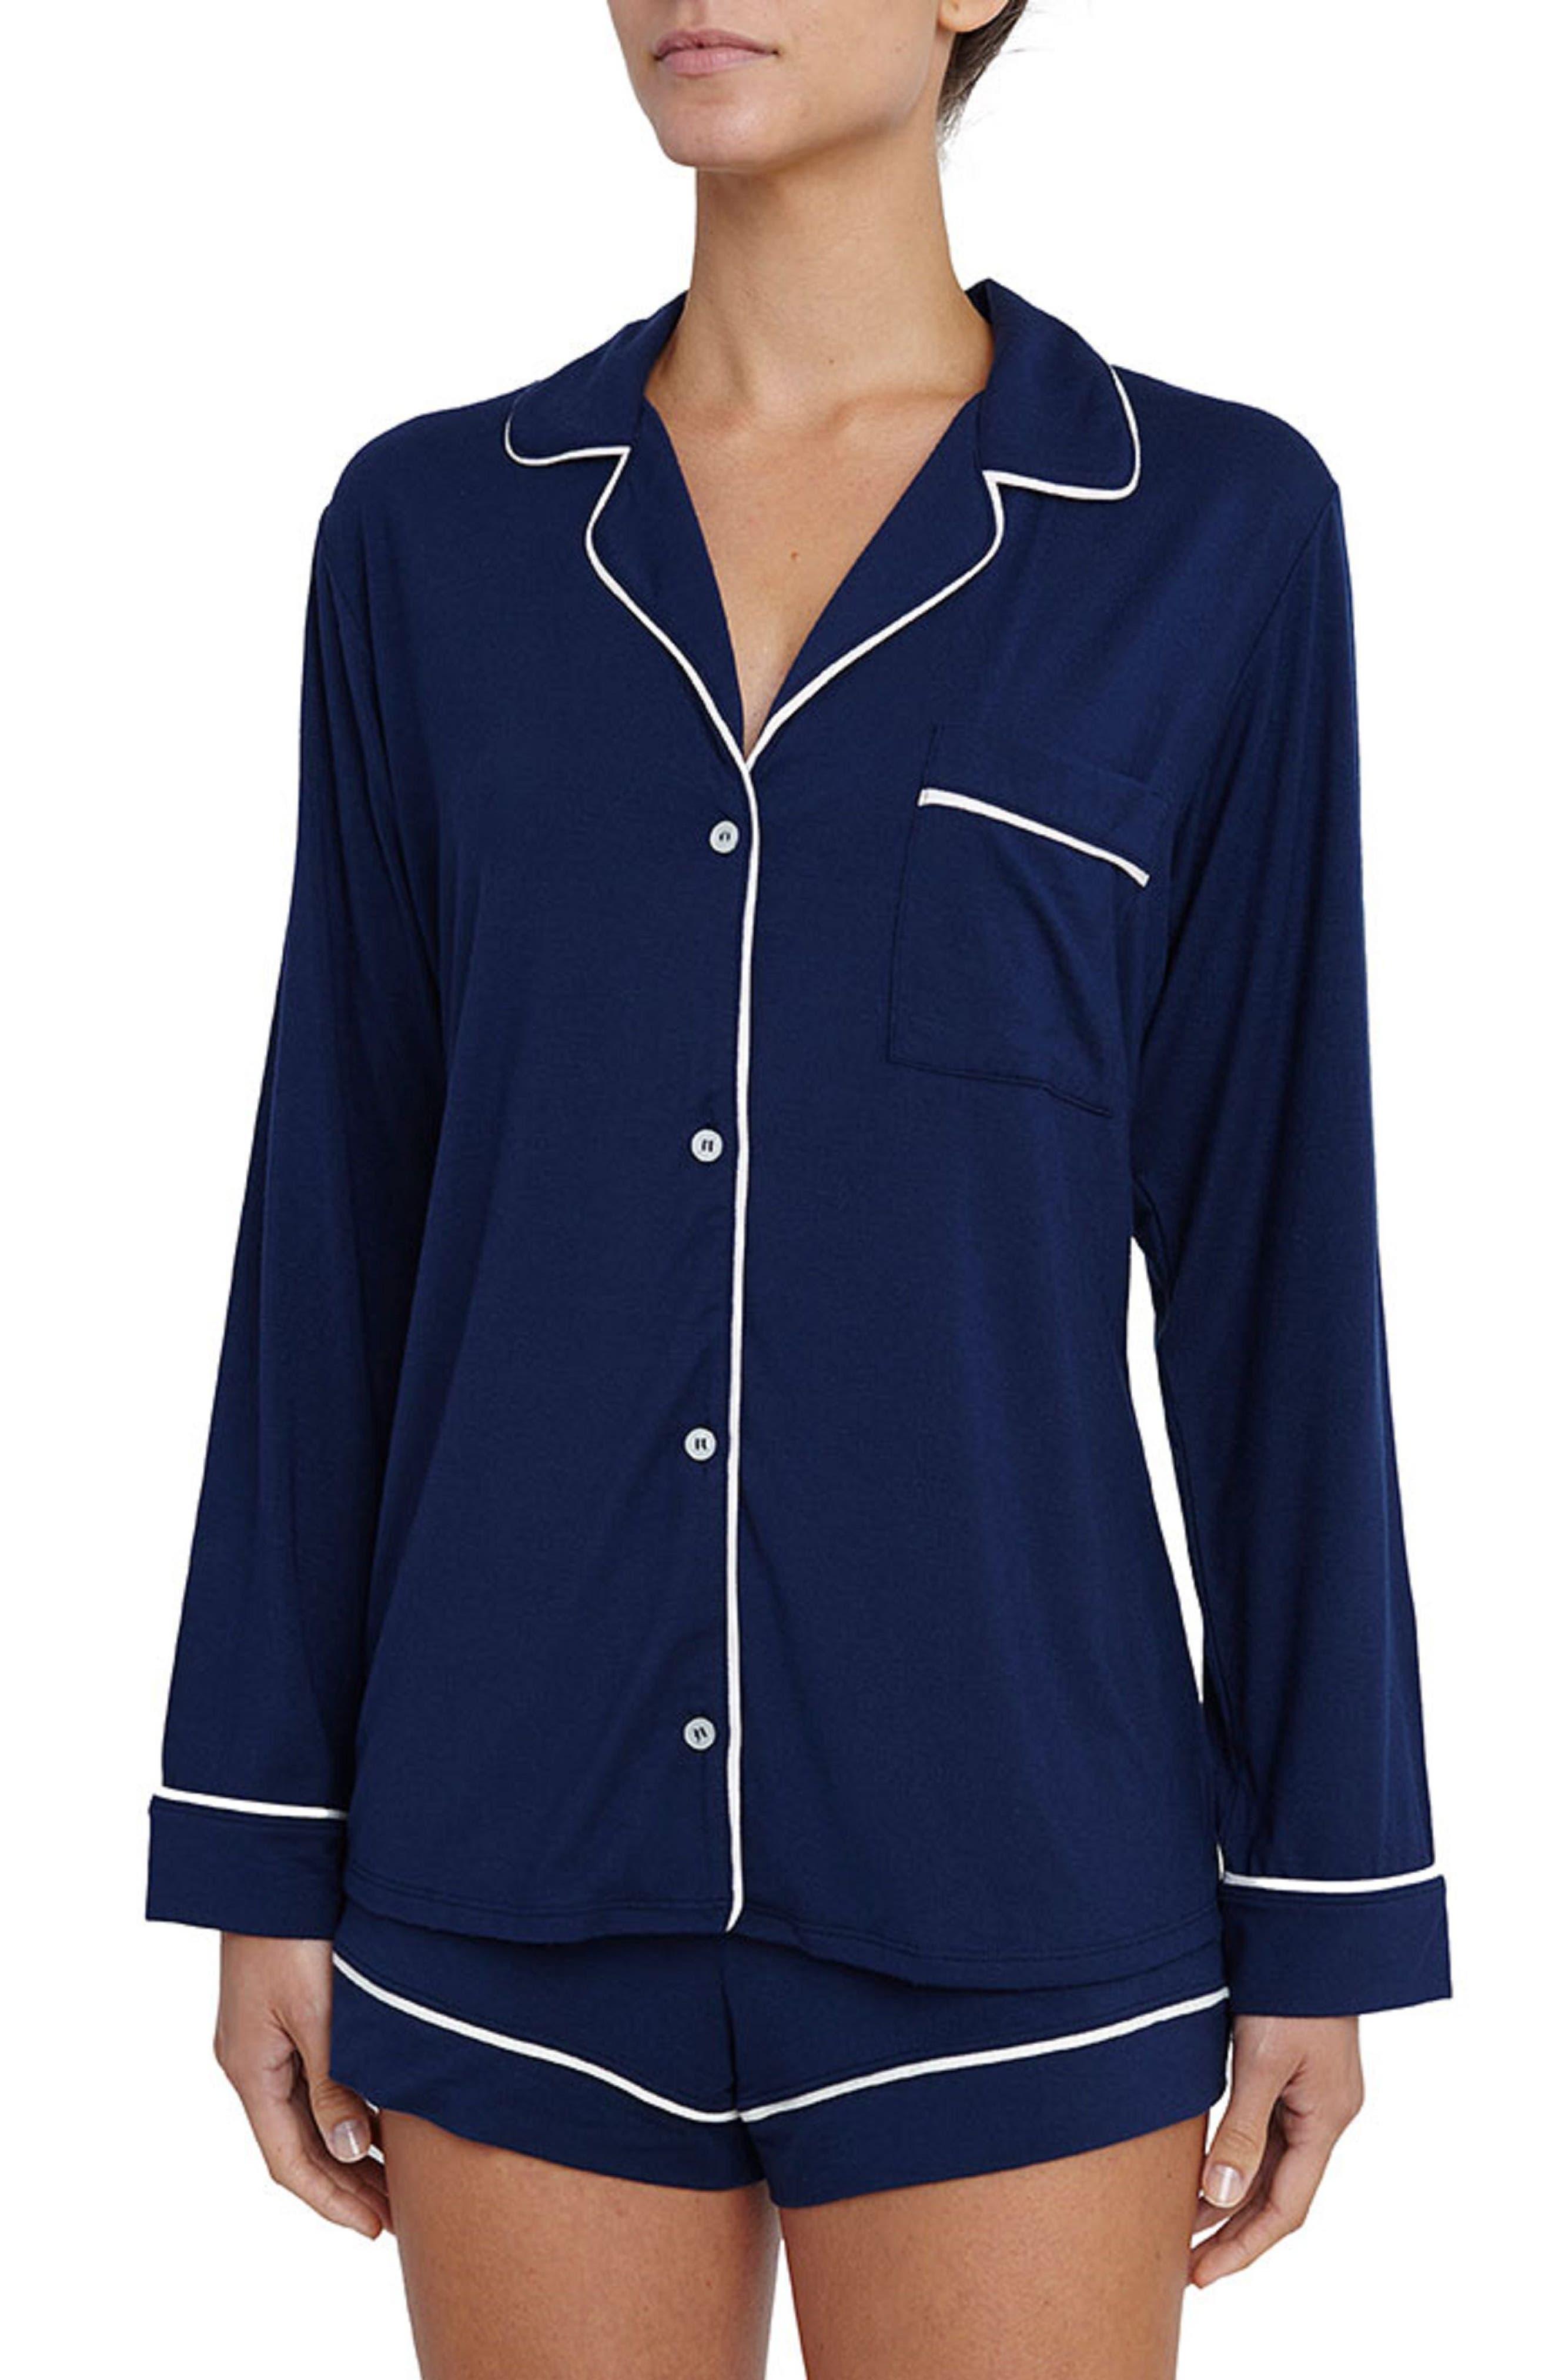 'Gisele' Short Pajamas,                         Main,                         color, 401